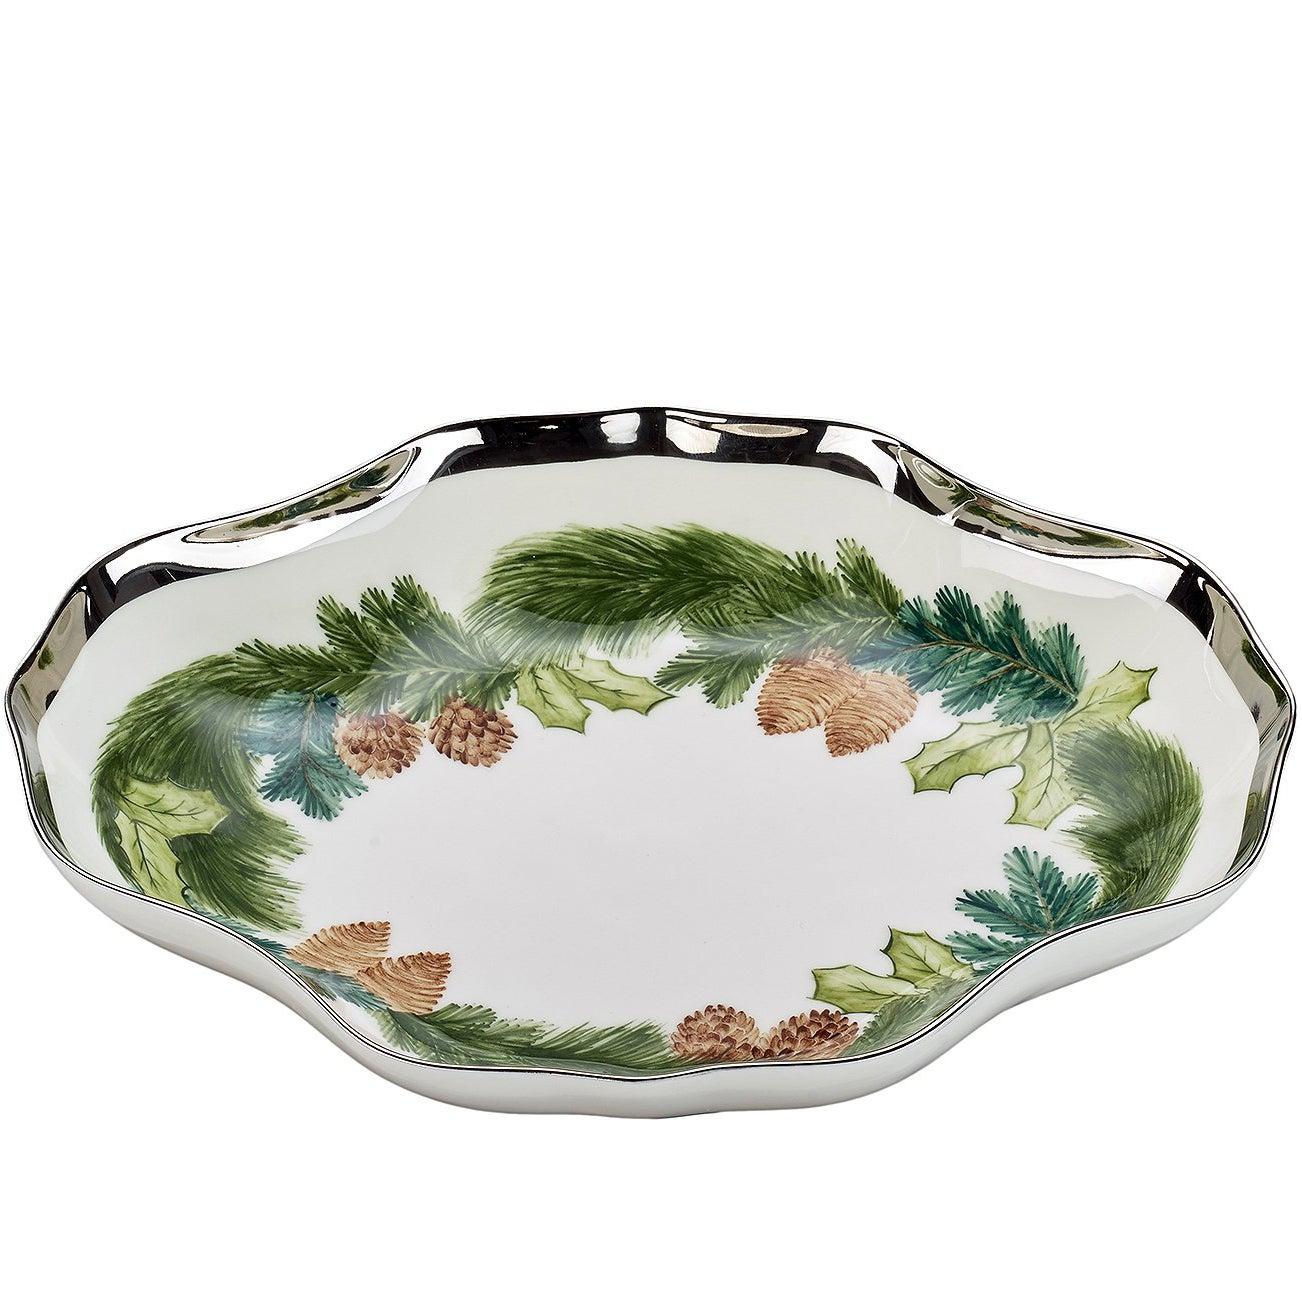 Black Forest  Porcelain Dish Christmas Garland Sofina Boutique Kitzbuehel